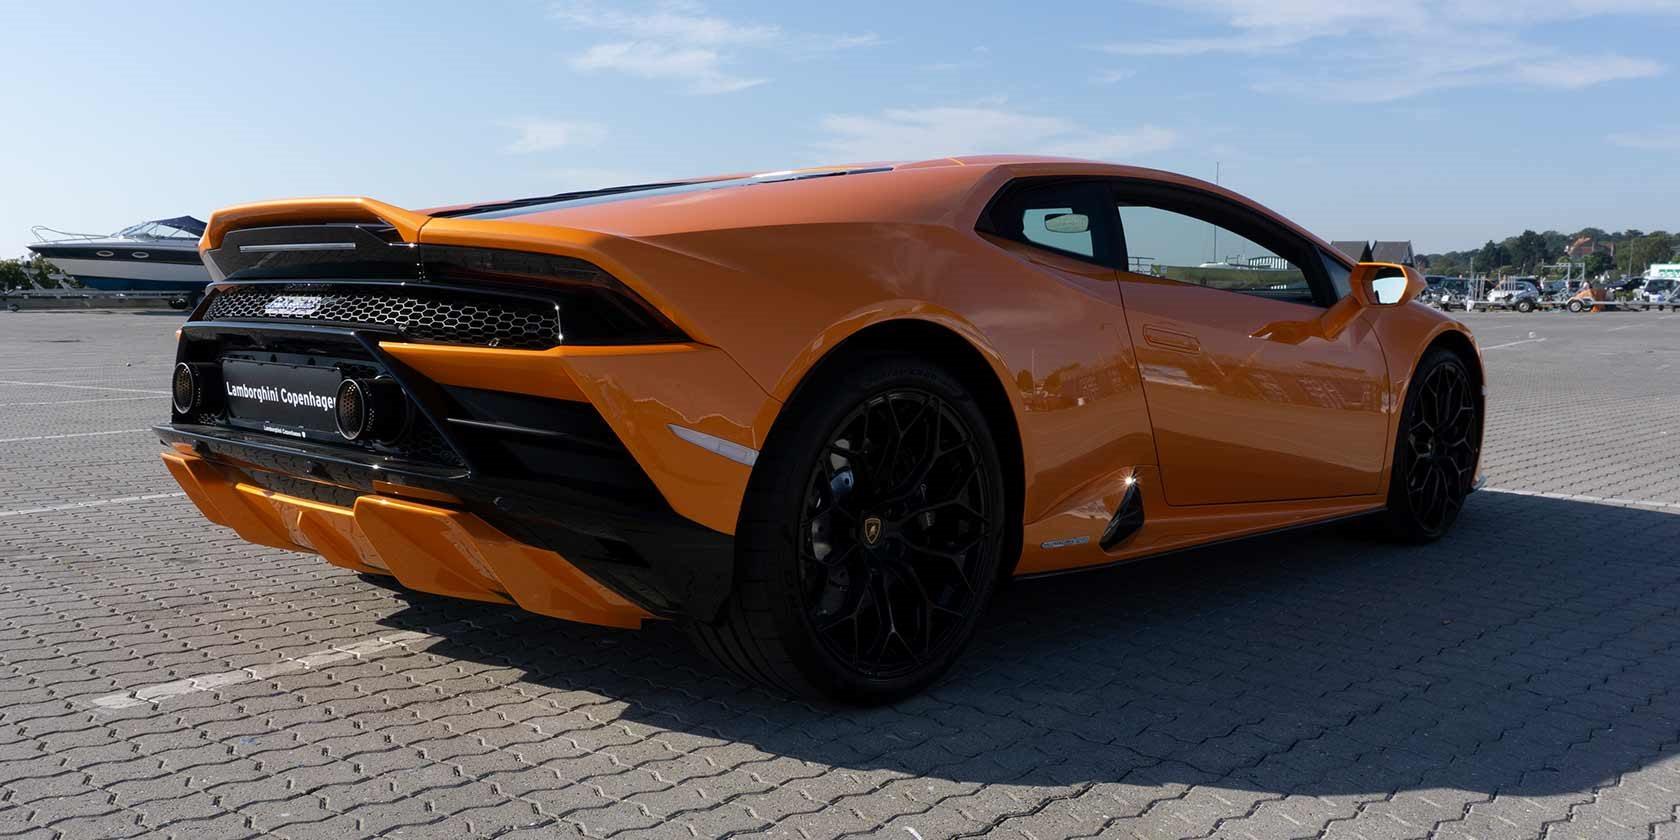 KAUFMANN_1680x840_Lamborghini_thejournal_02.jpg